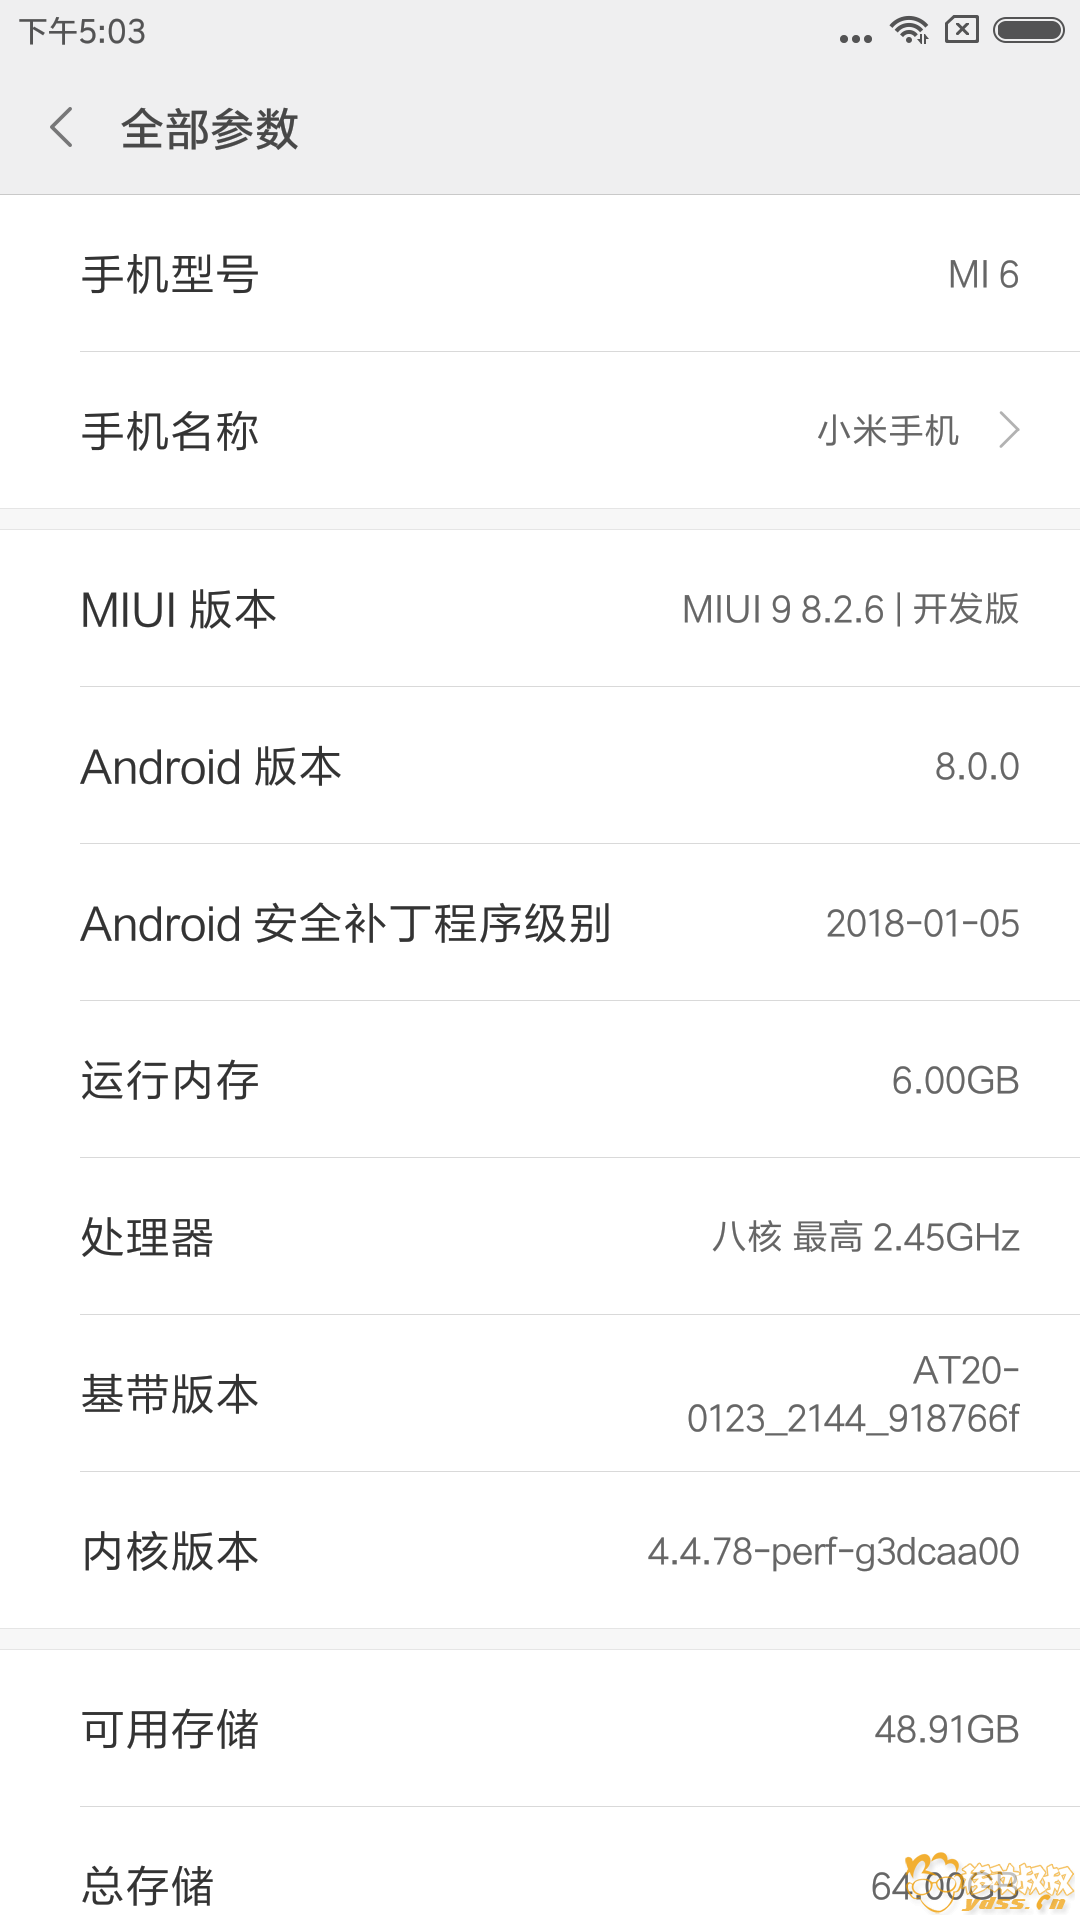 Screenshot_2018-02-06-17-03-10-219_com.android.settings.png